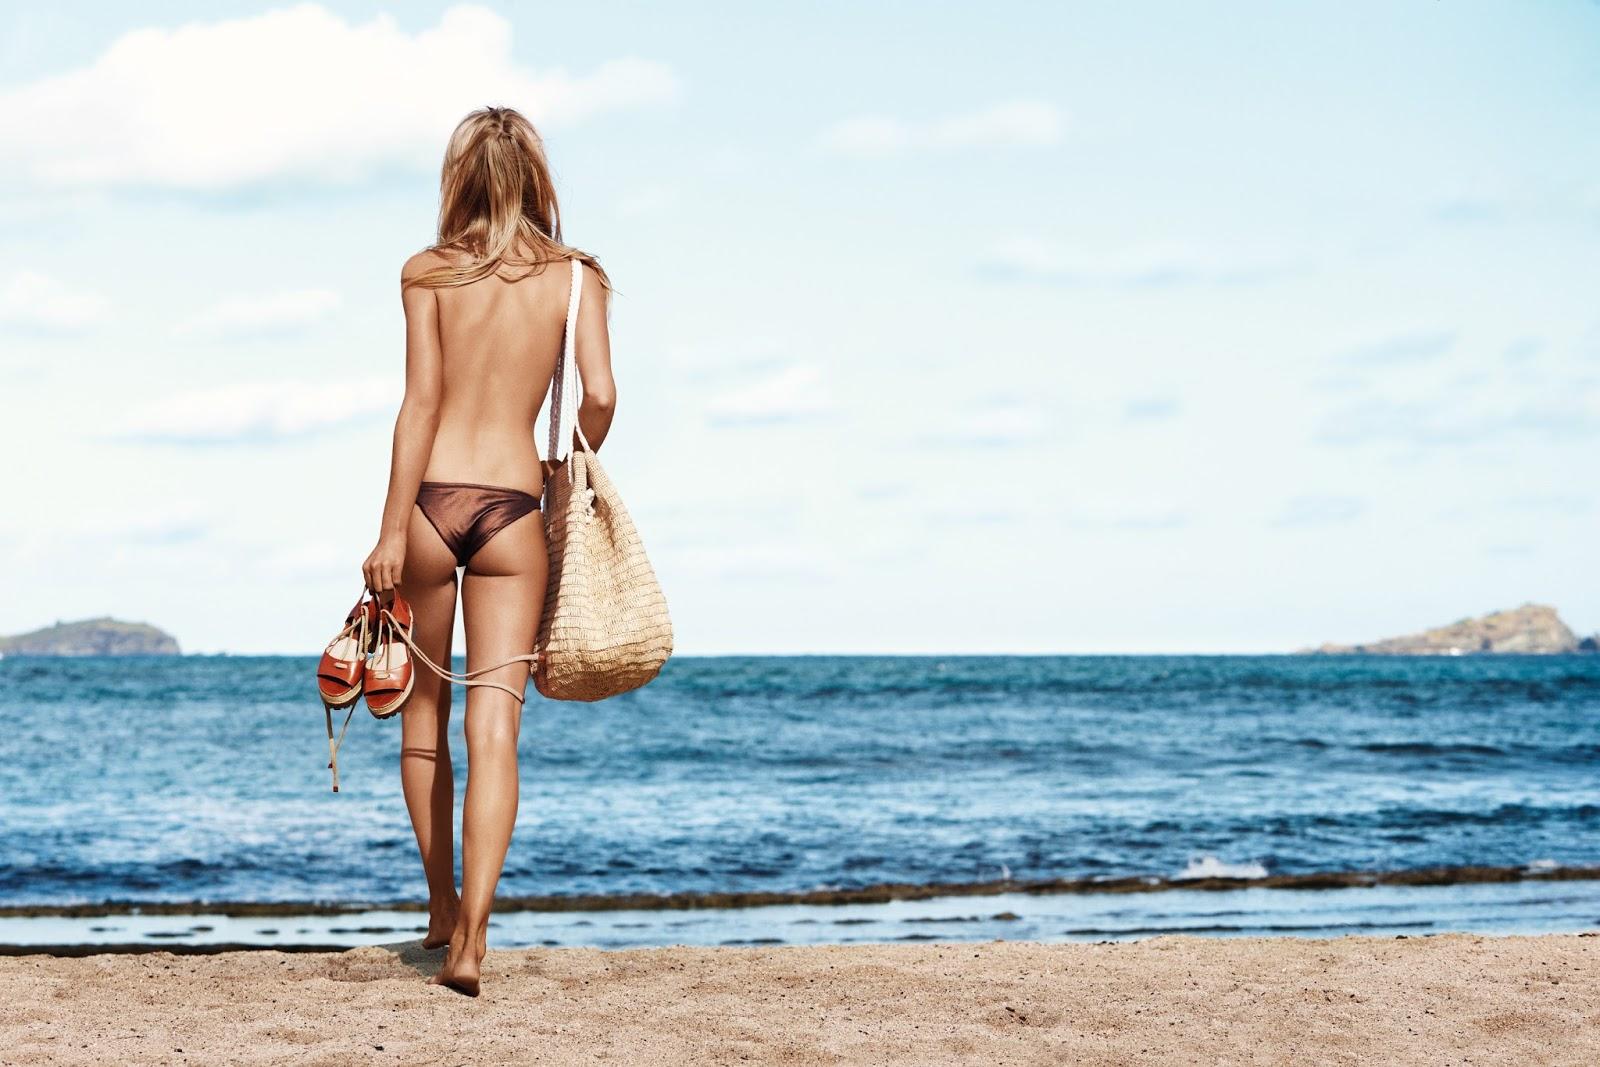 Armani emporio pre-fall collection, Sisters kardashian lingerie shoot